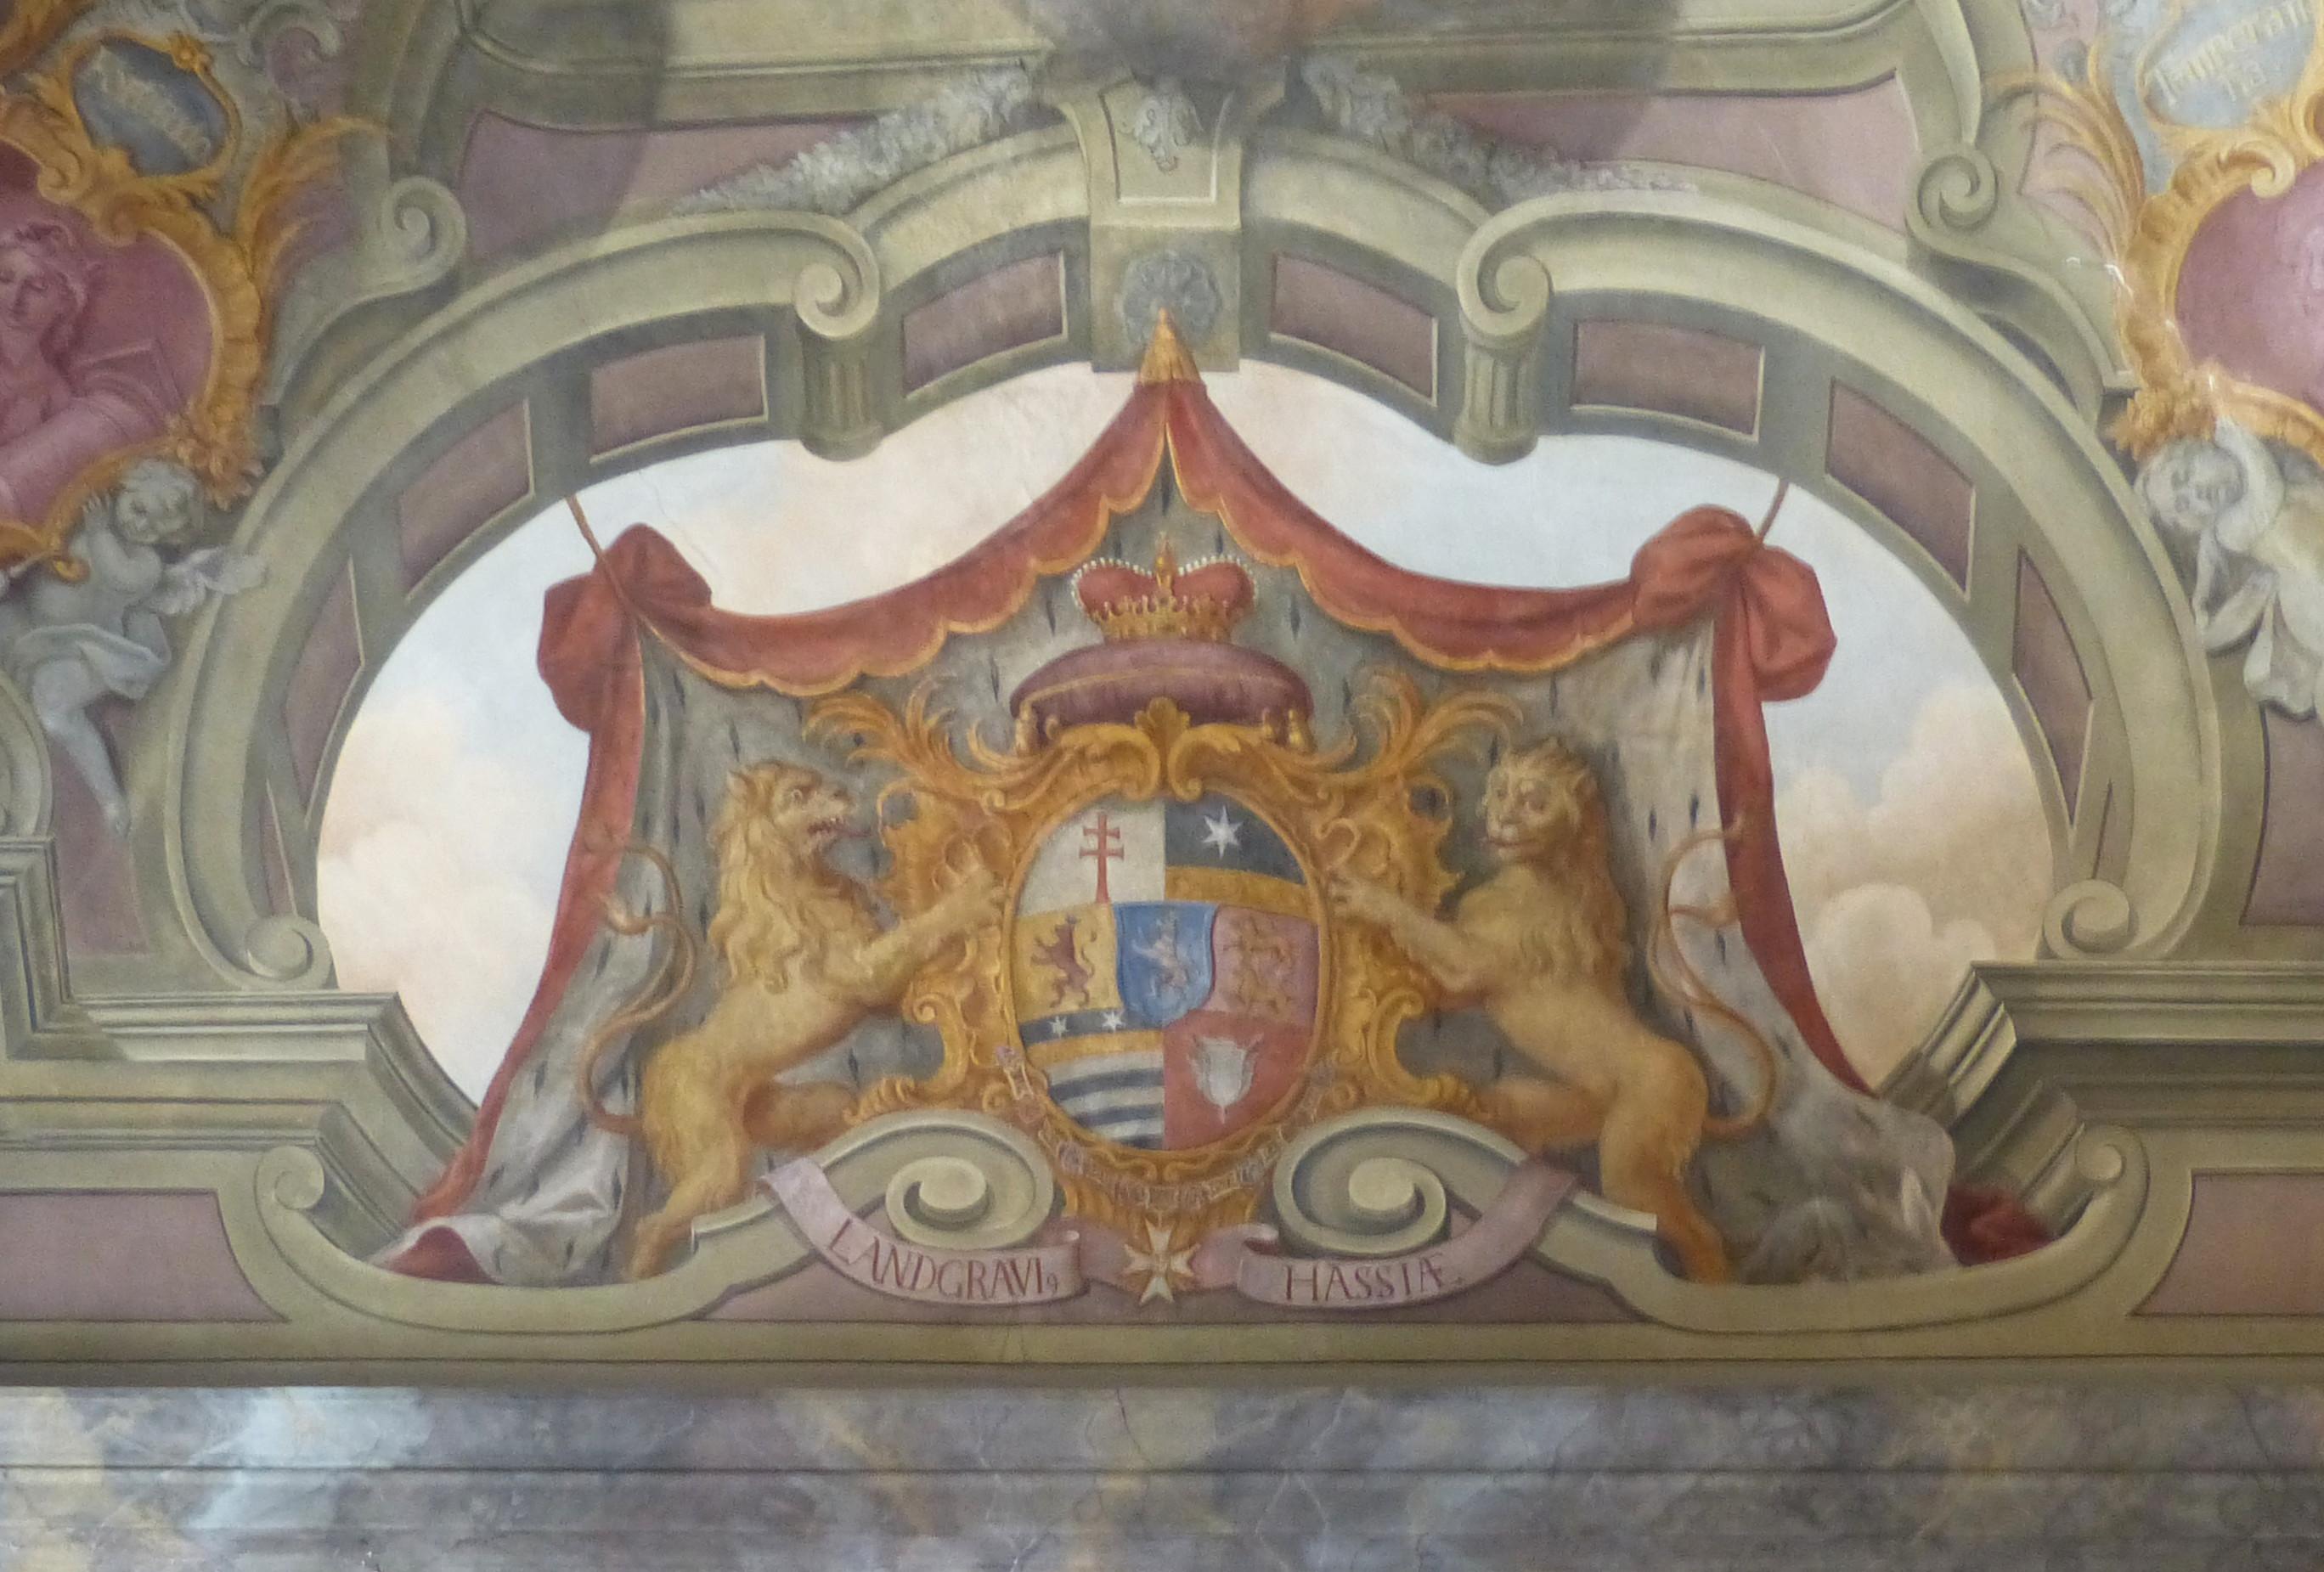 https://upload.wikimedia.org/wikipedia/commons/1/1d/Augsburg_F%C3%BCrstbisch%C3%B6fliche_Residenz_Prunkaufgang_Landgravi_Hassiae.jpg